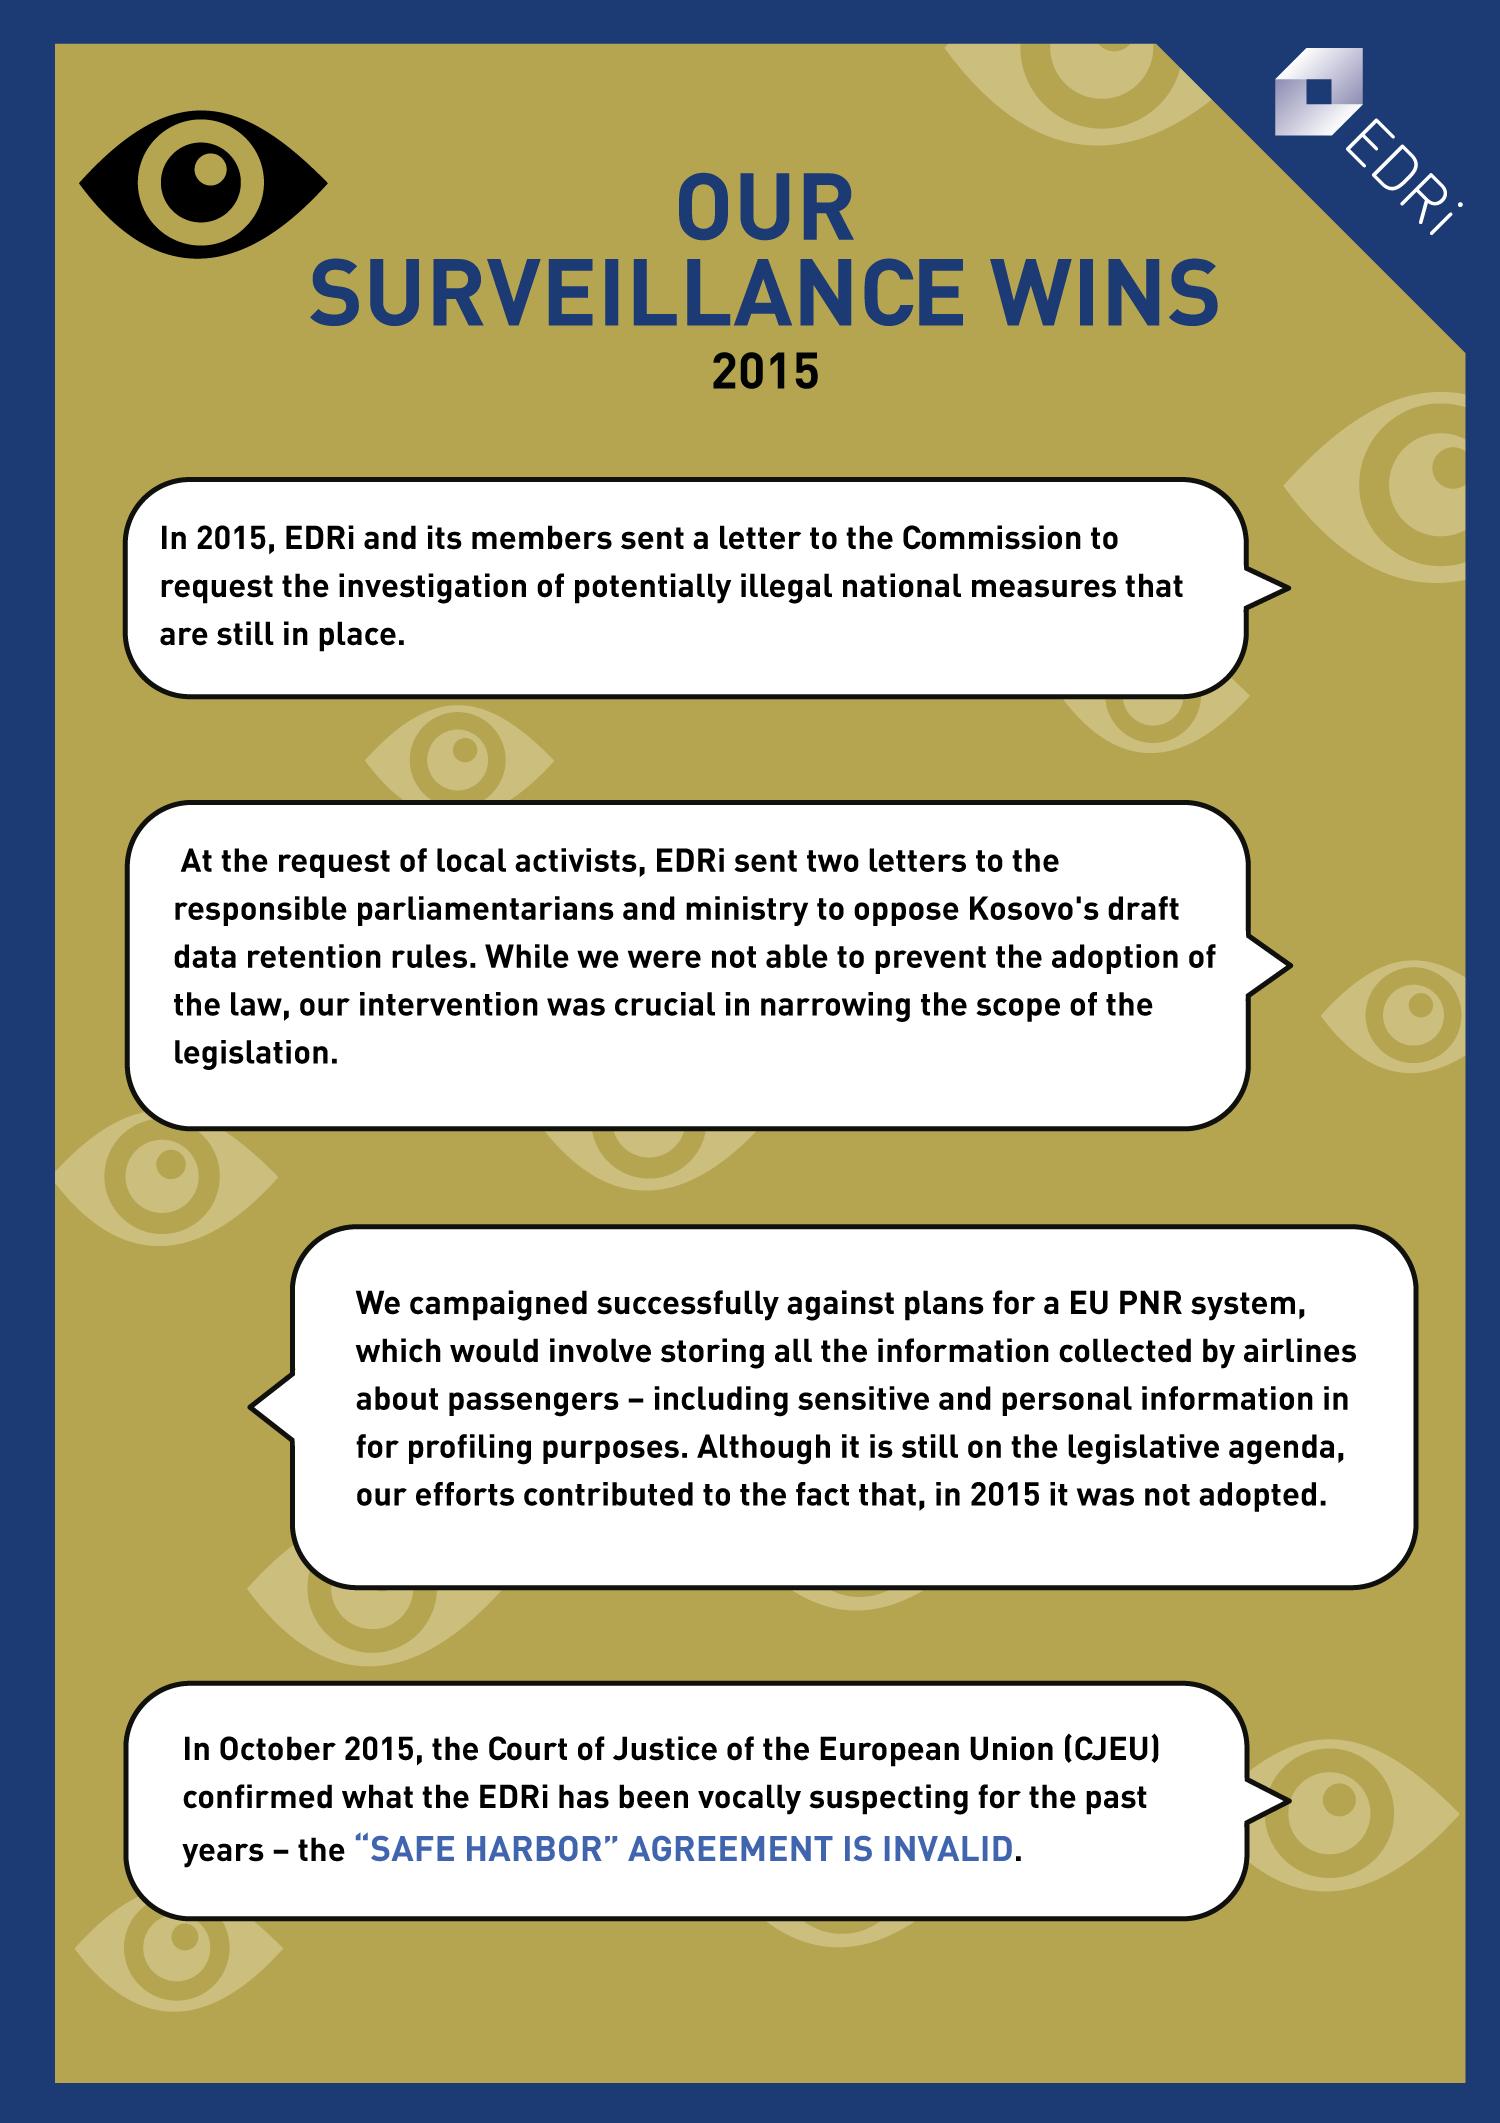 Net Neutrality Archives - Page 6 of 22 - EDRi